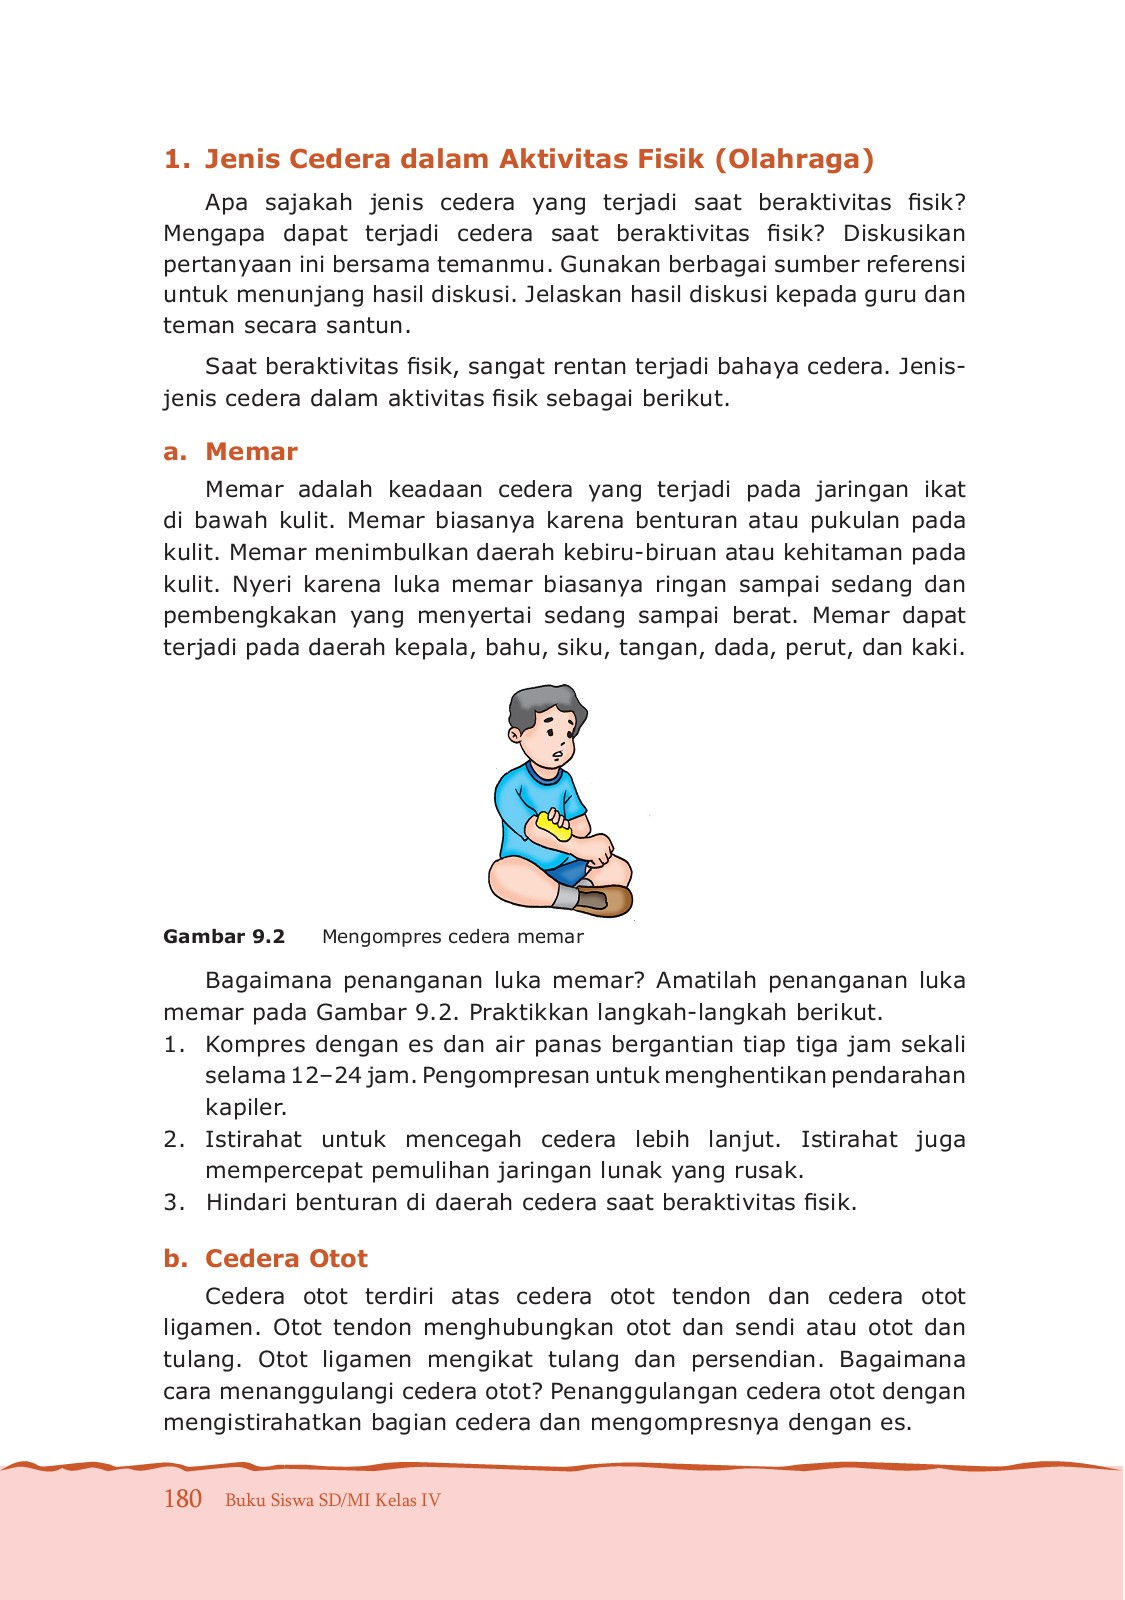 Tuliskan Macam-macam Cedera Yang Sering Terjadi Ketika Berolahraga : tuliskan, macam-macam, cedera, sering, terjadi, ketika, berolahraga, SISWA, KELAS, Pages, Download, FlipHTML5